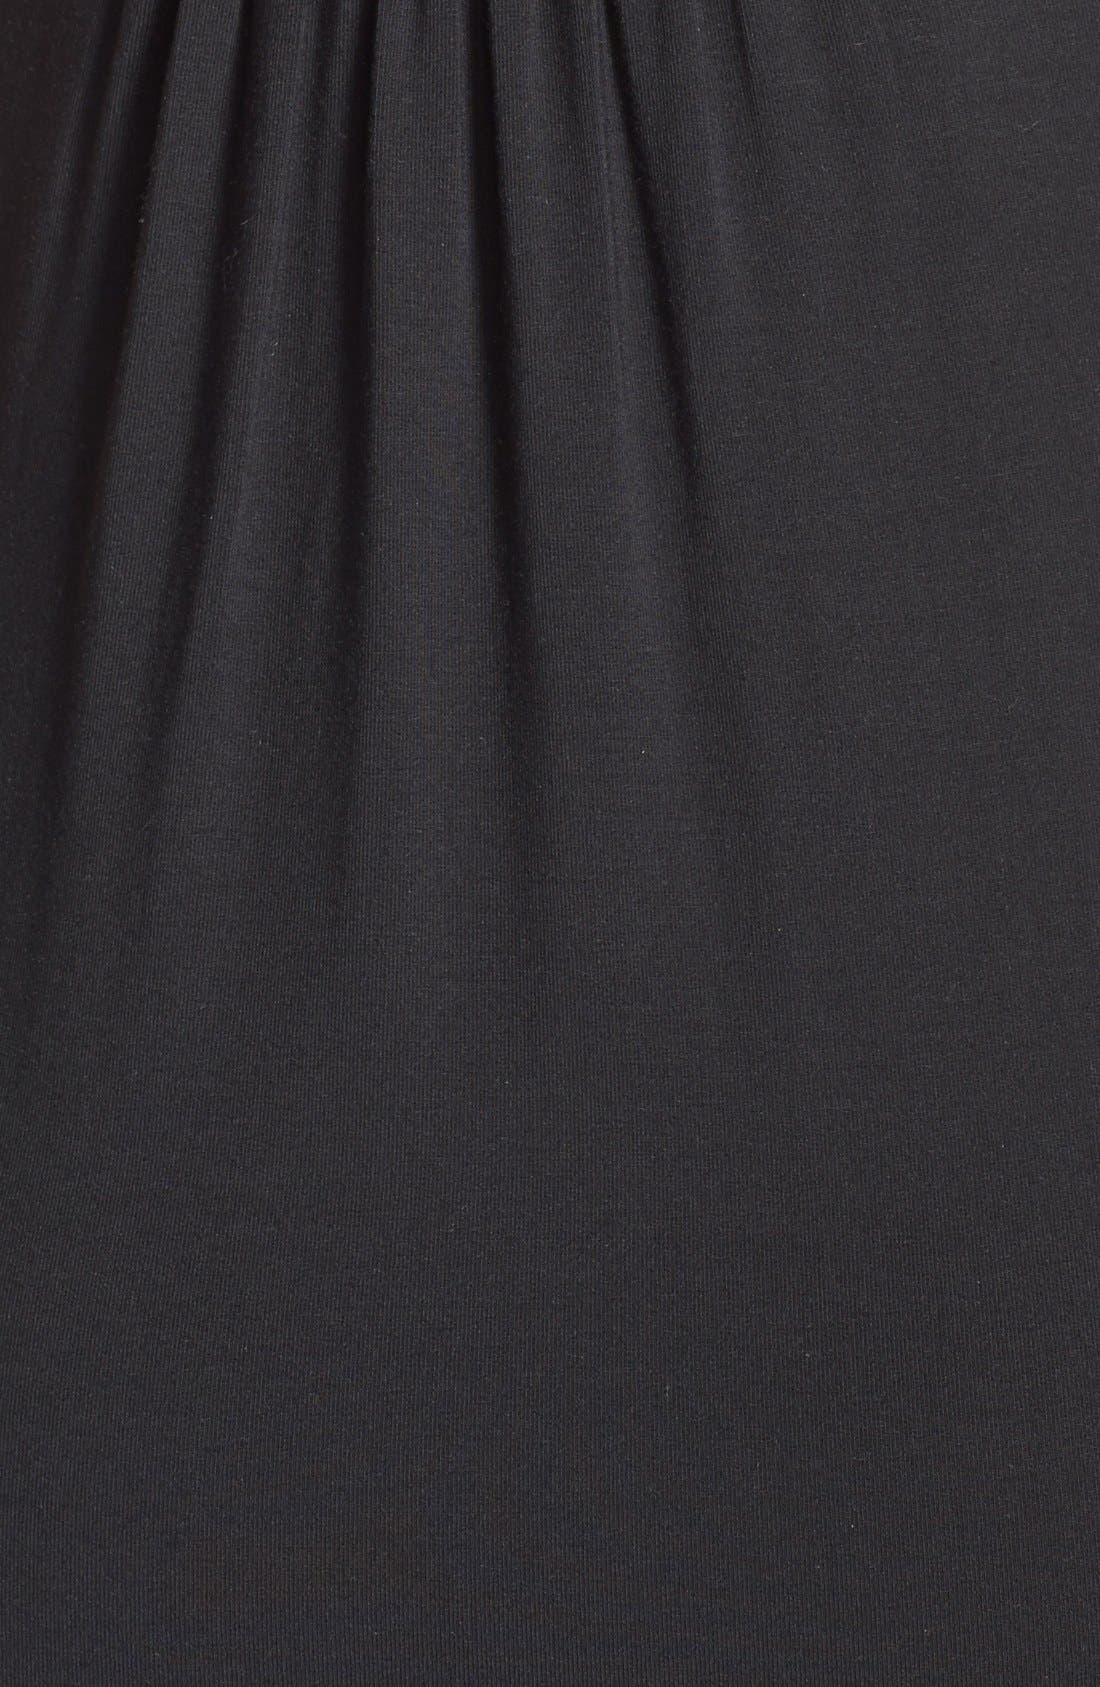 'Callie' Jersey Maxi Maternity Dress,                             Alternate thumbnail 4, color,                             BLACK